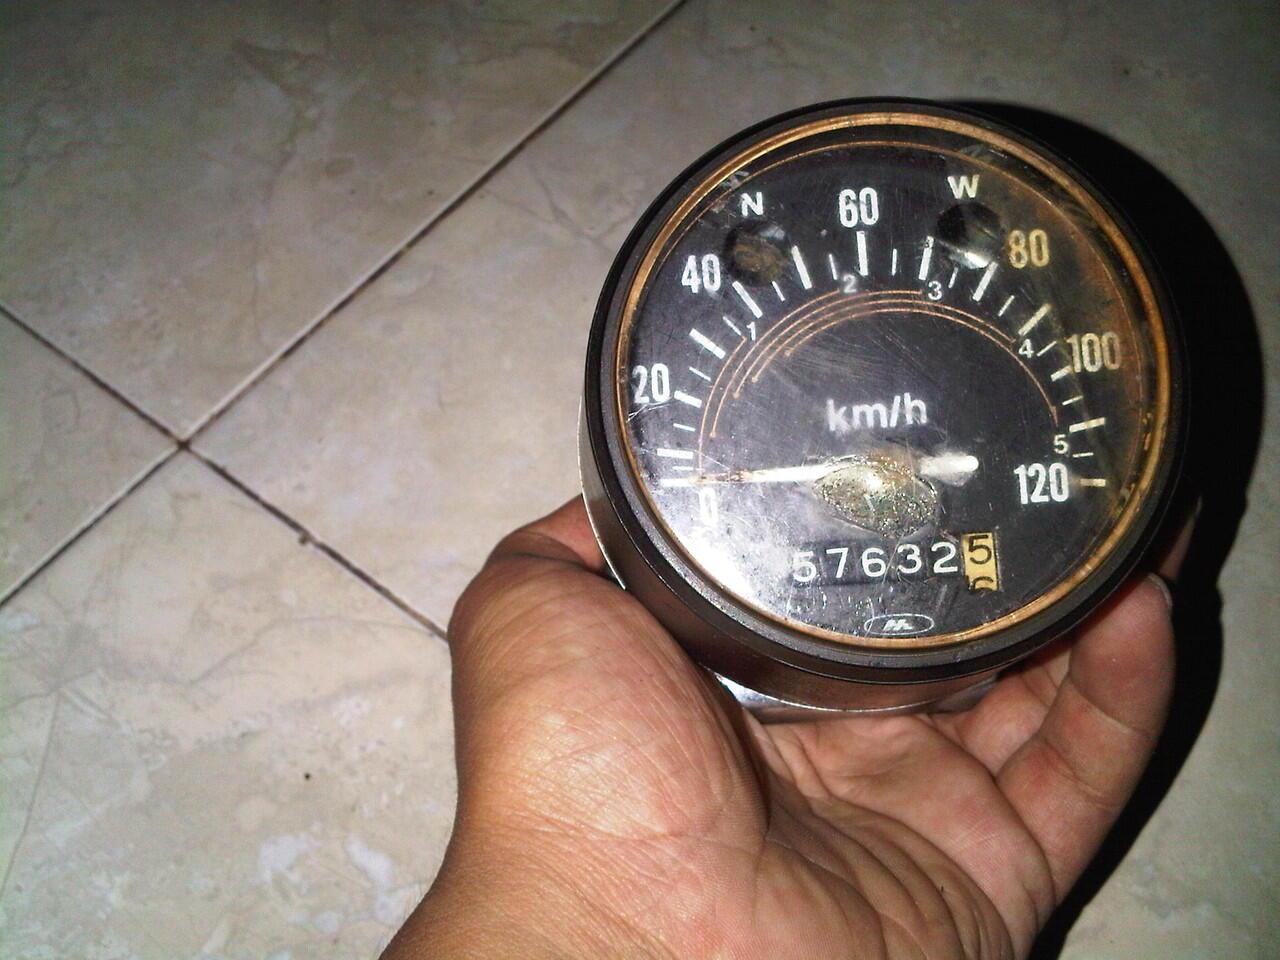 dijual spidometer cb 100 ori 2nd,lengkap dengan dudukannya